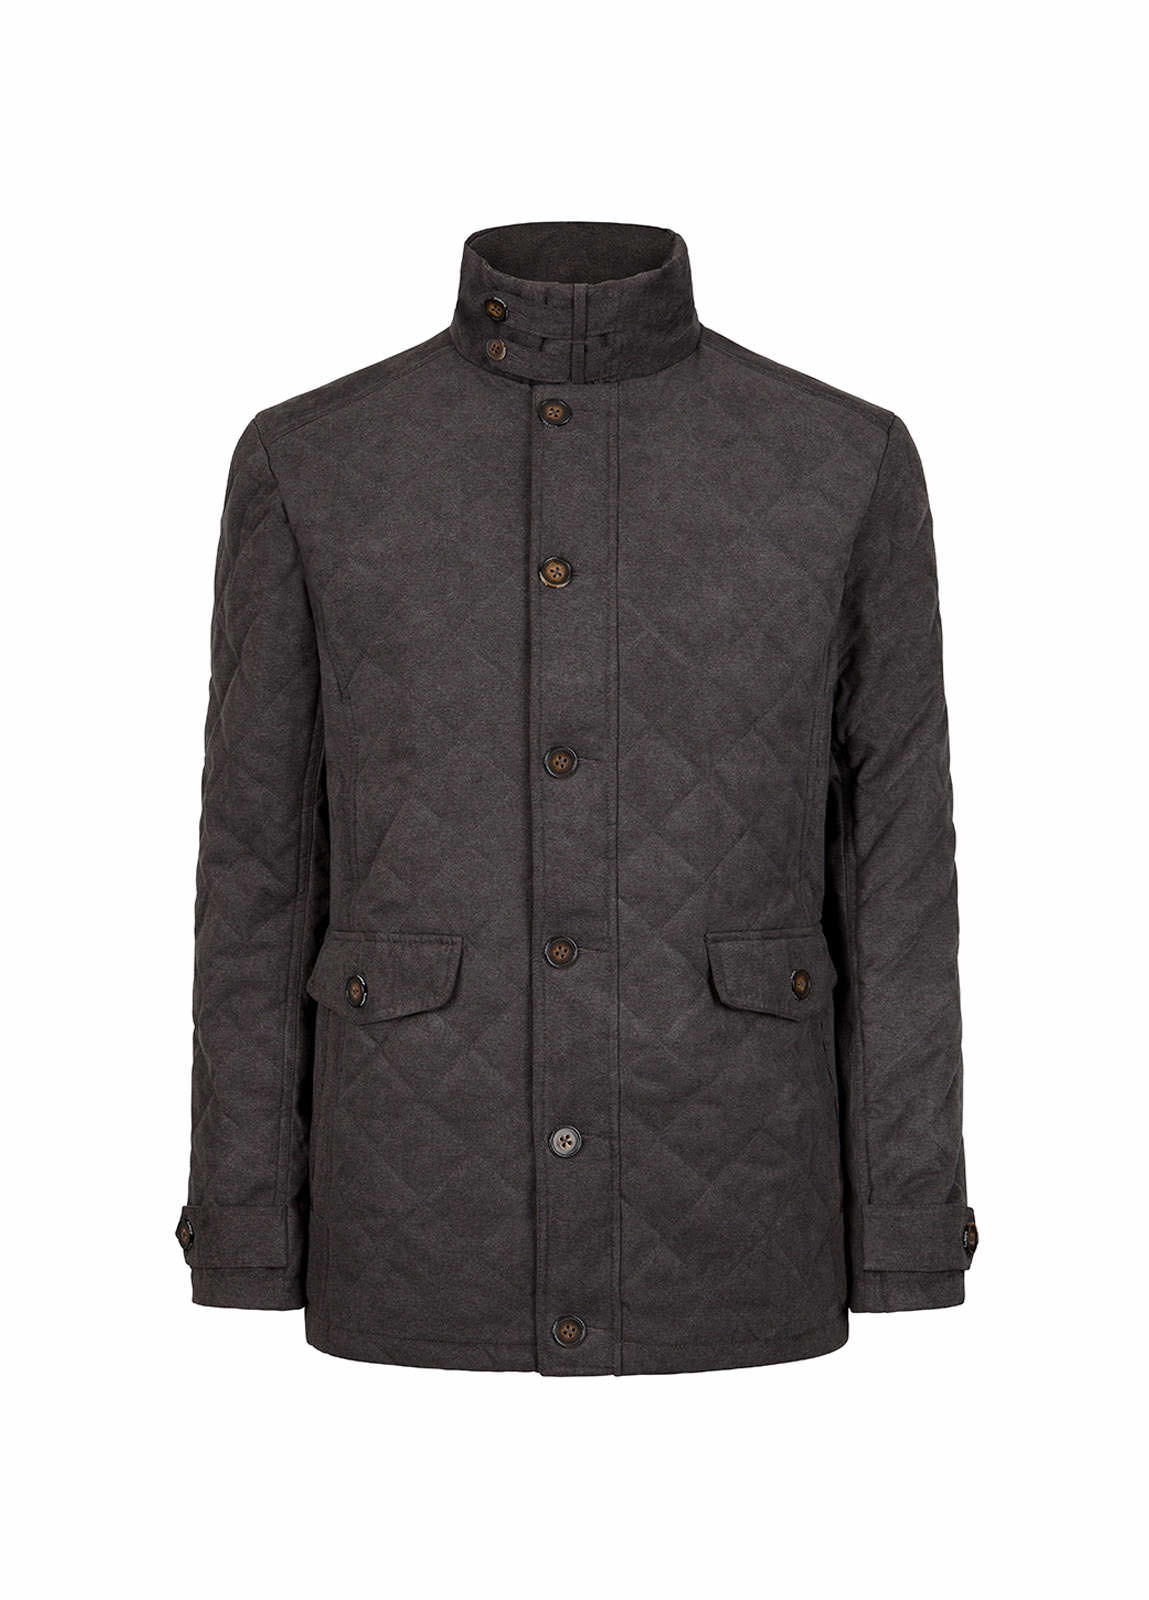 Dubarry_ Donovan Men's Jacket - Graphite_Image_2